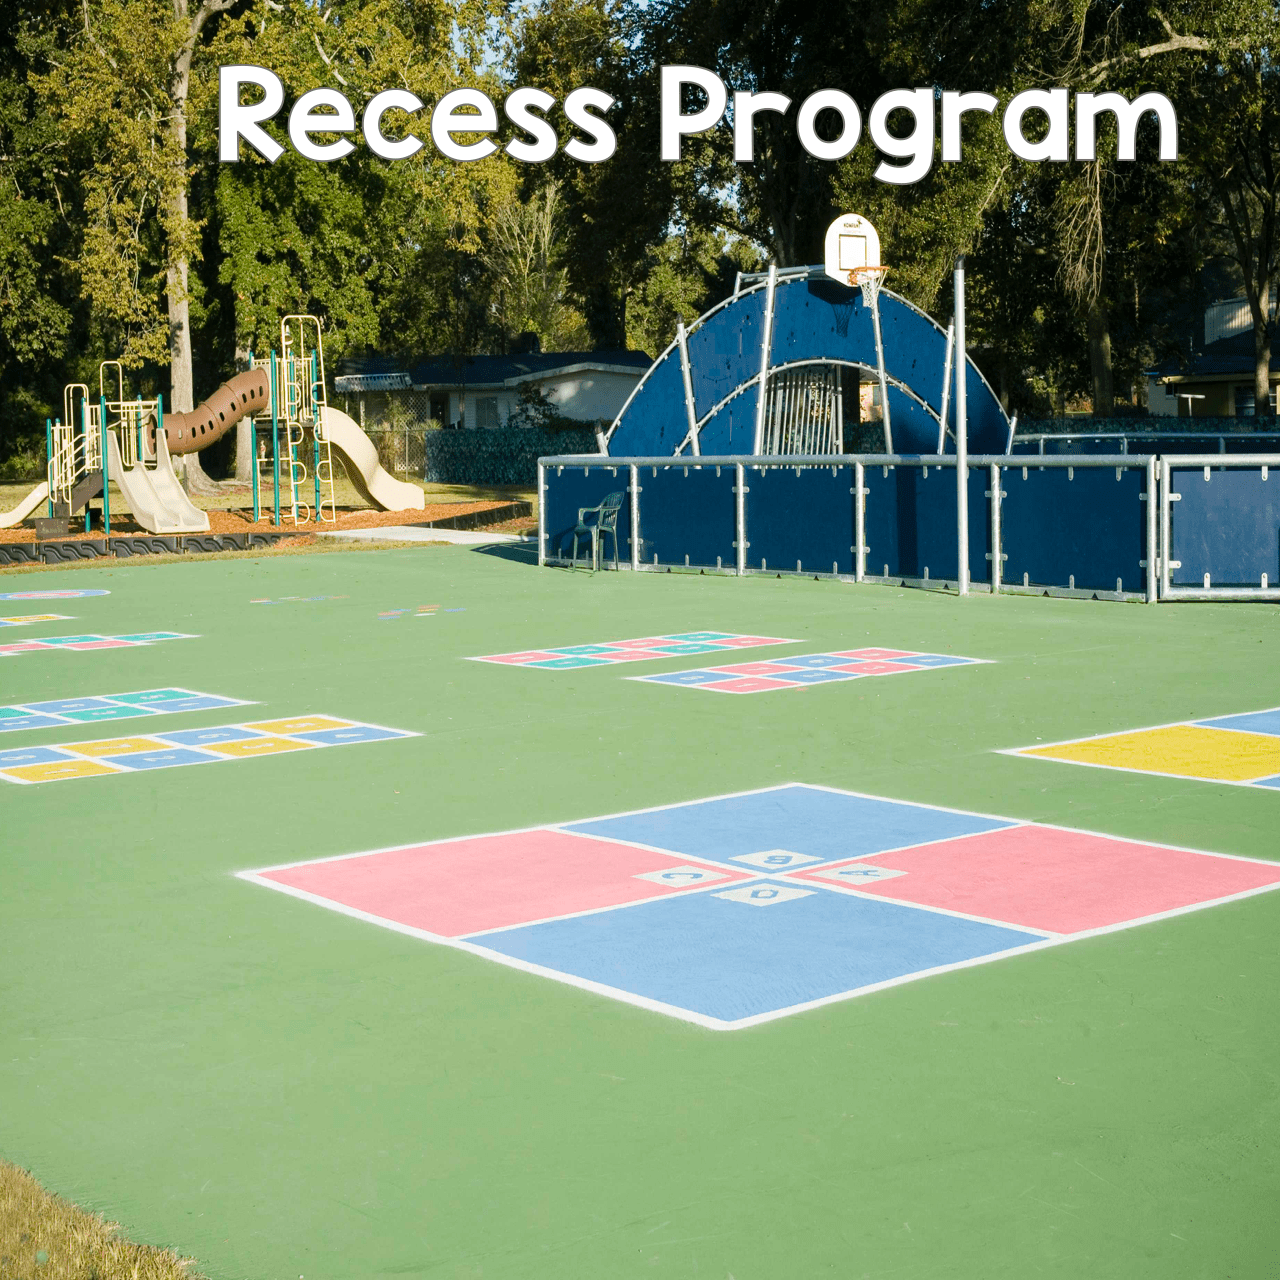 Recess Program Stecils Peaceful Playgrounds - Playground stencils